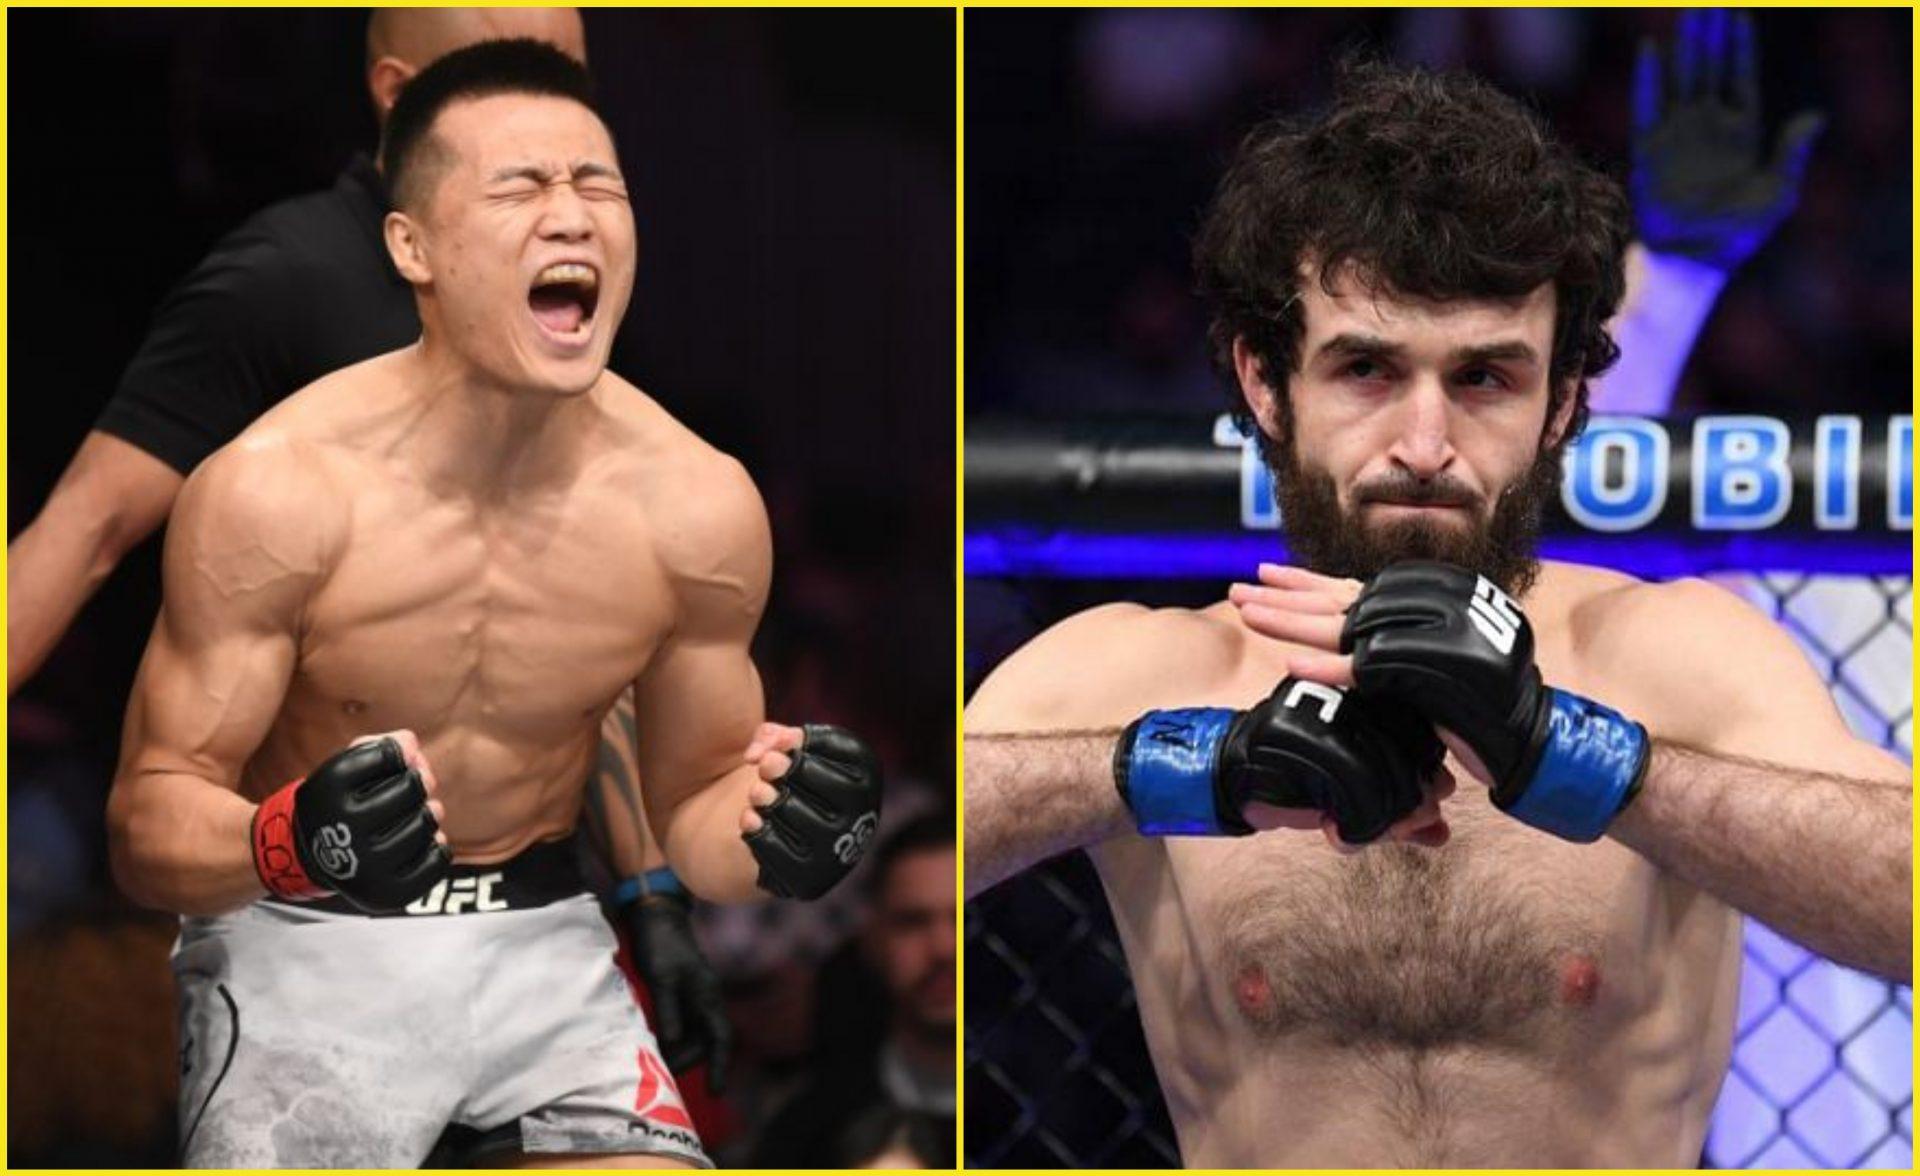 The Korean Zombie wants to fight Zabit Magomedsharipov Next - Zombie